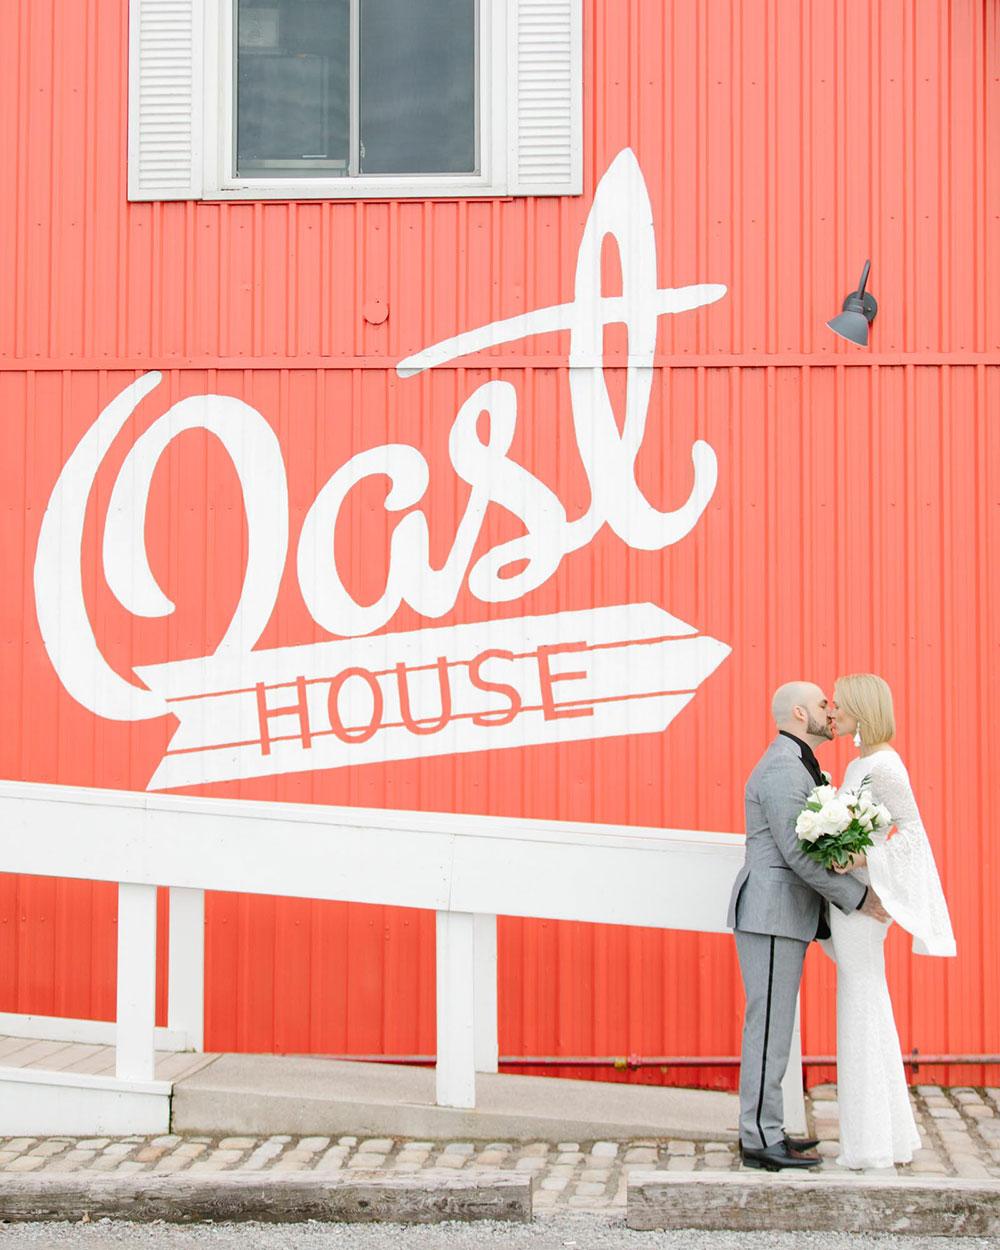 oast-house-wedding-niagara-on-the-lake-pop-up-weddings-photo-by-nataschia-wielink-photography-0015.JPG